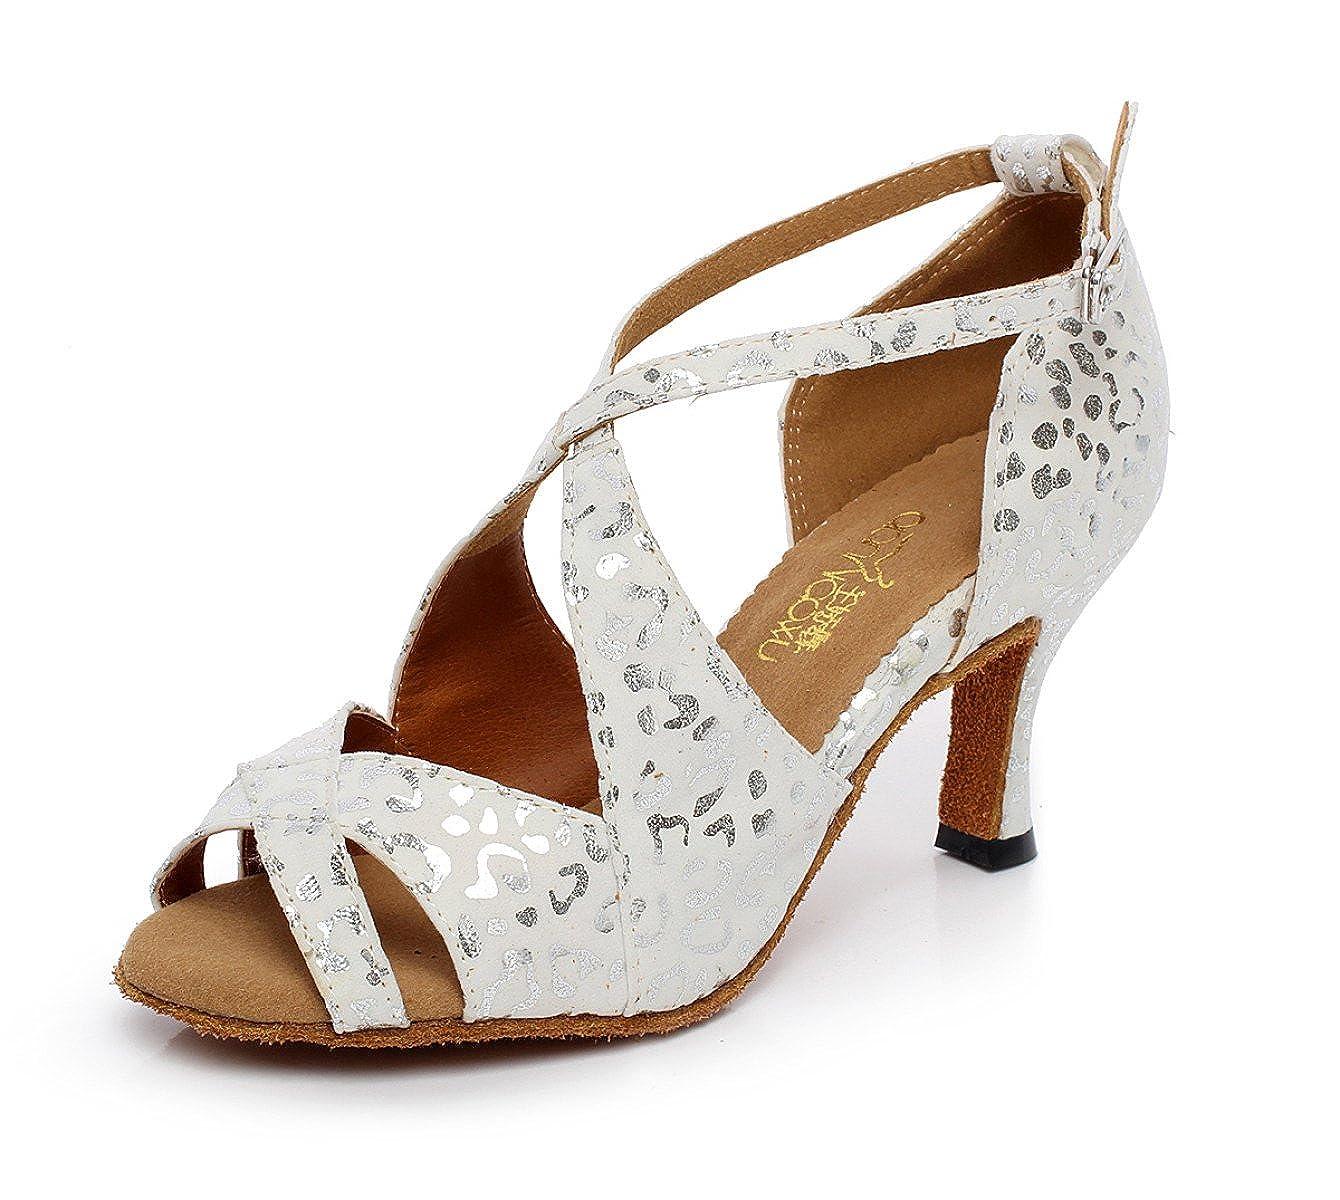 JSHOE Chaussures De Latin Danse Salsa Latin Sandales PU PU B071HXSLTF Salsa/Tango/Thé/Samba/Moderne/Jazz Sandales Chaussures Talons Hauts,White-heeled6cm-UK6/EU39/Our40 - bbacdf9 - reprogrammed.space